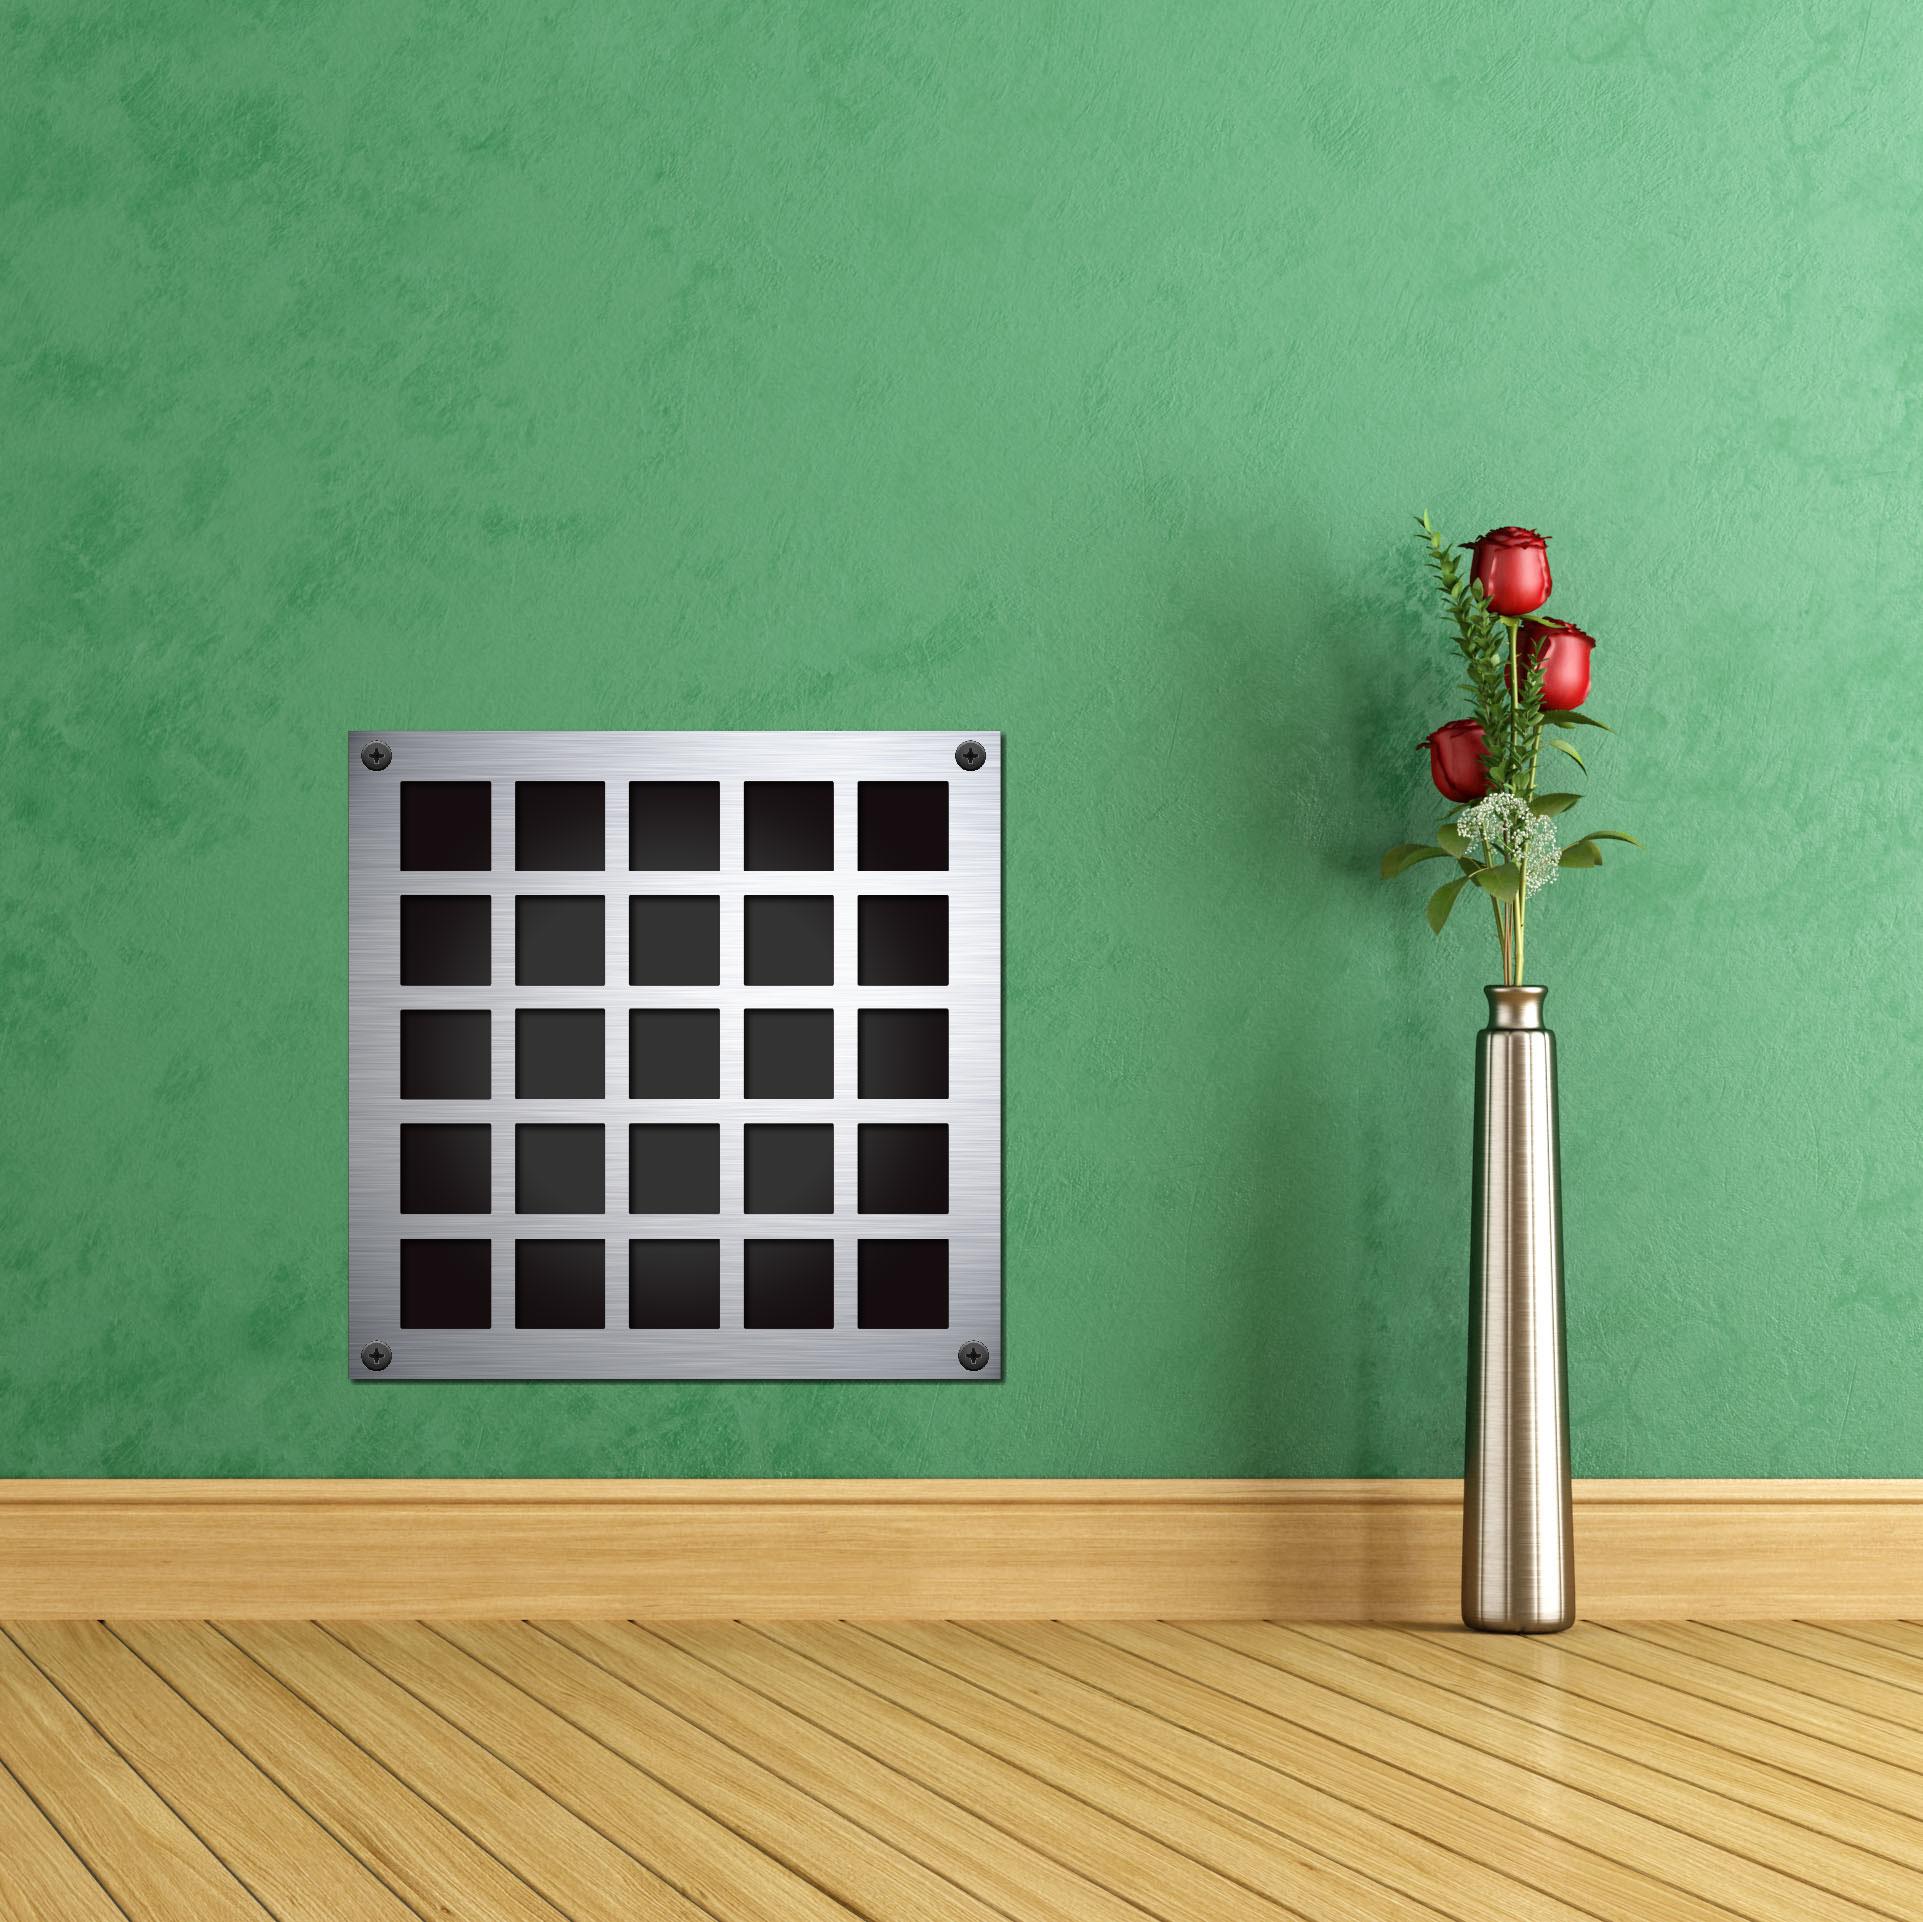 lattice-wall-01.jpg